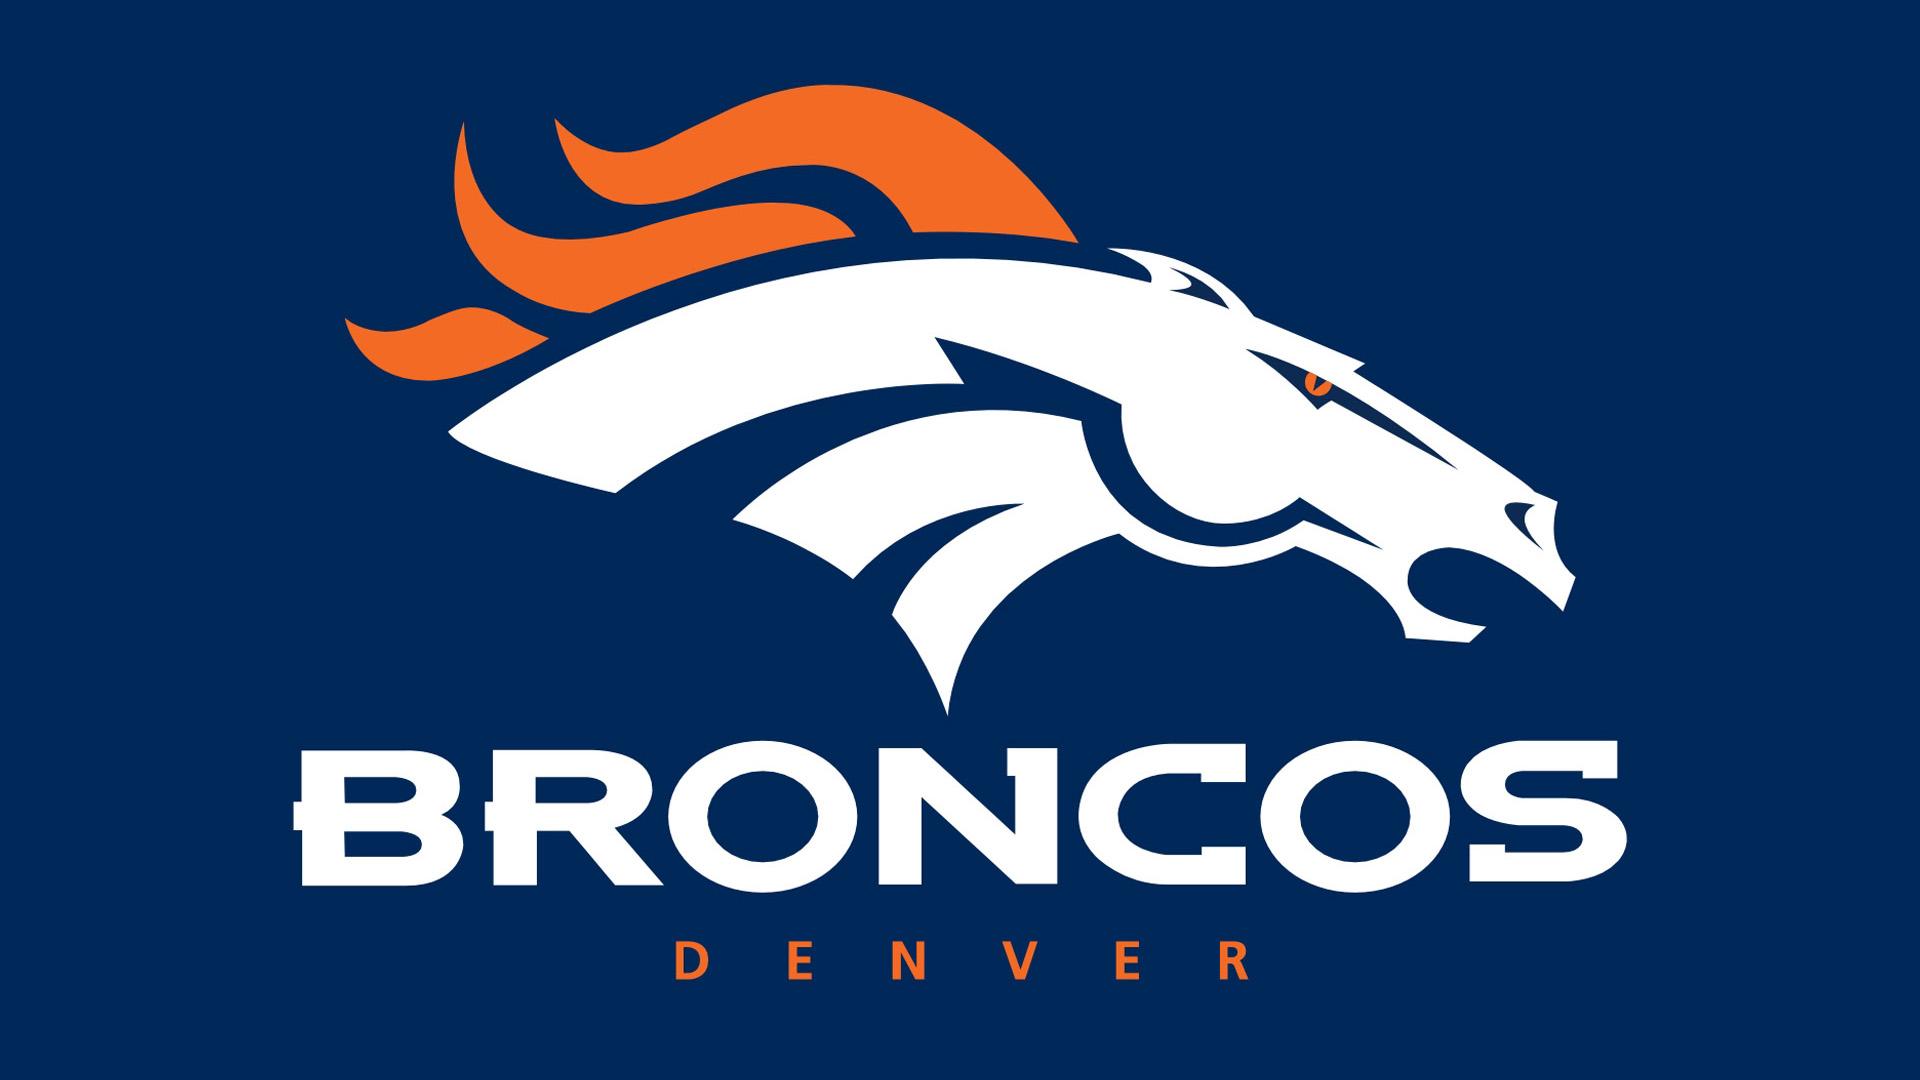 Denver Broncos Horse Logo 1920x1080 HD Image Sports NFL Football 1920x1080